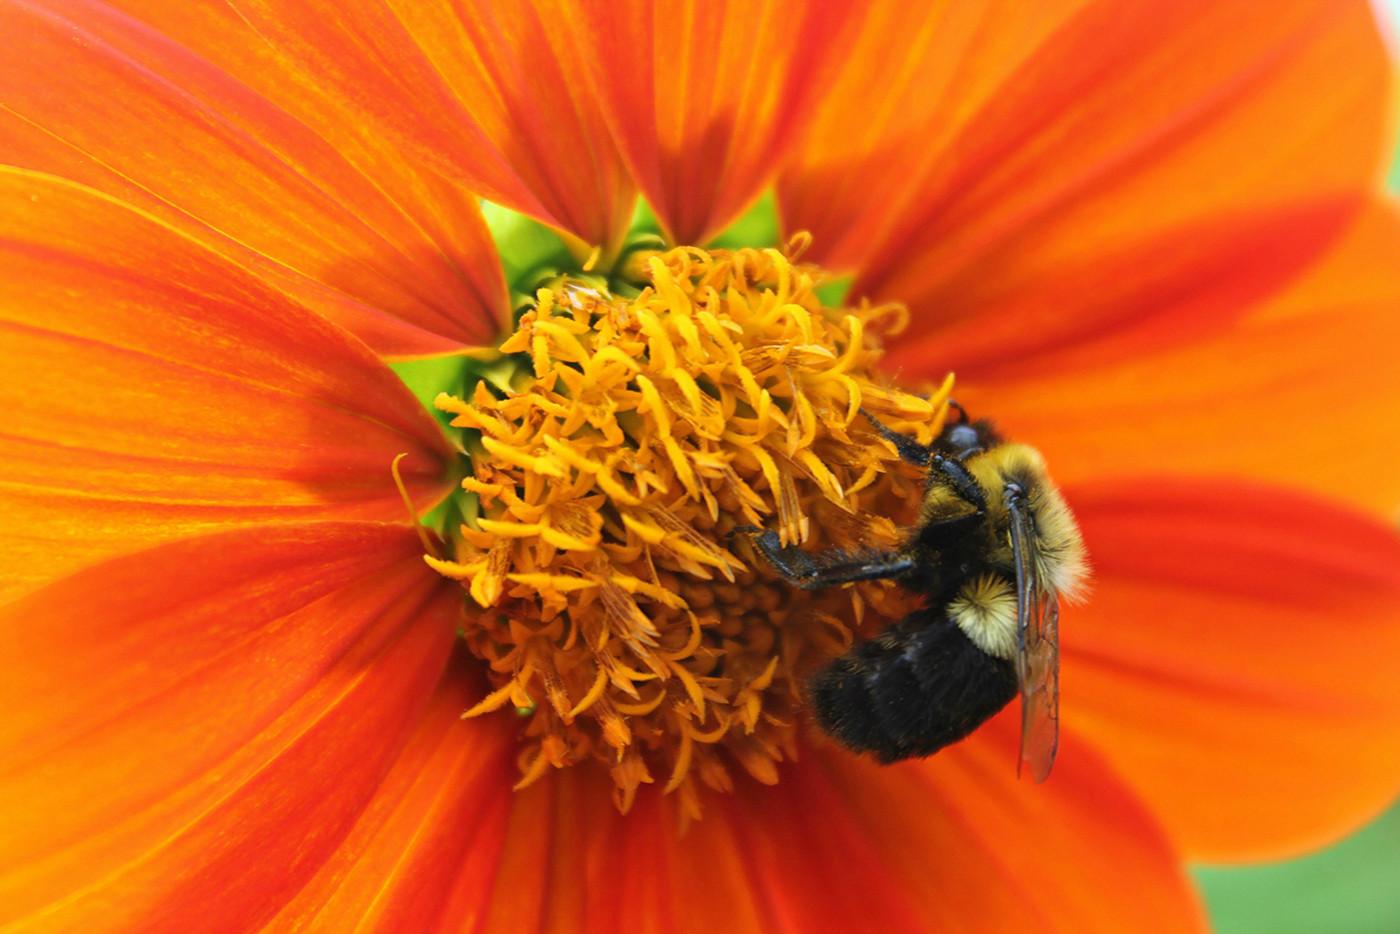 Busy Bee_Cheryl Martinelli_24.5_24.5.jpg